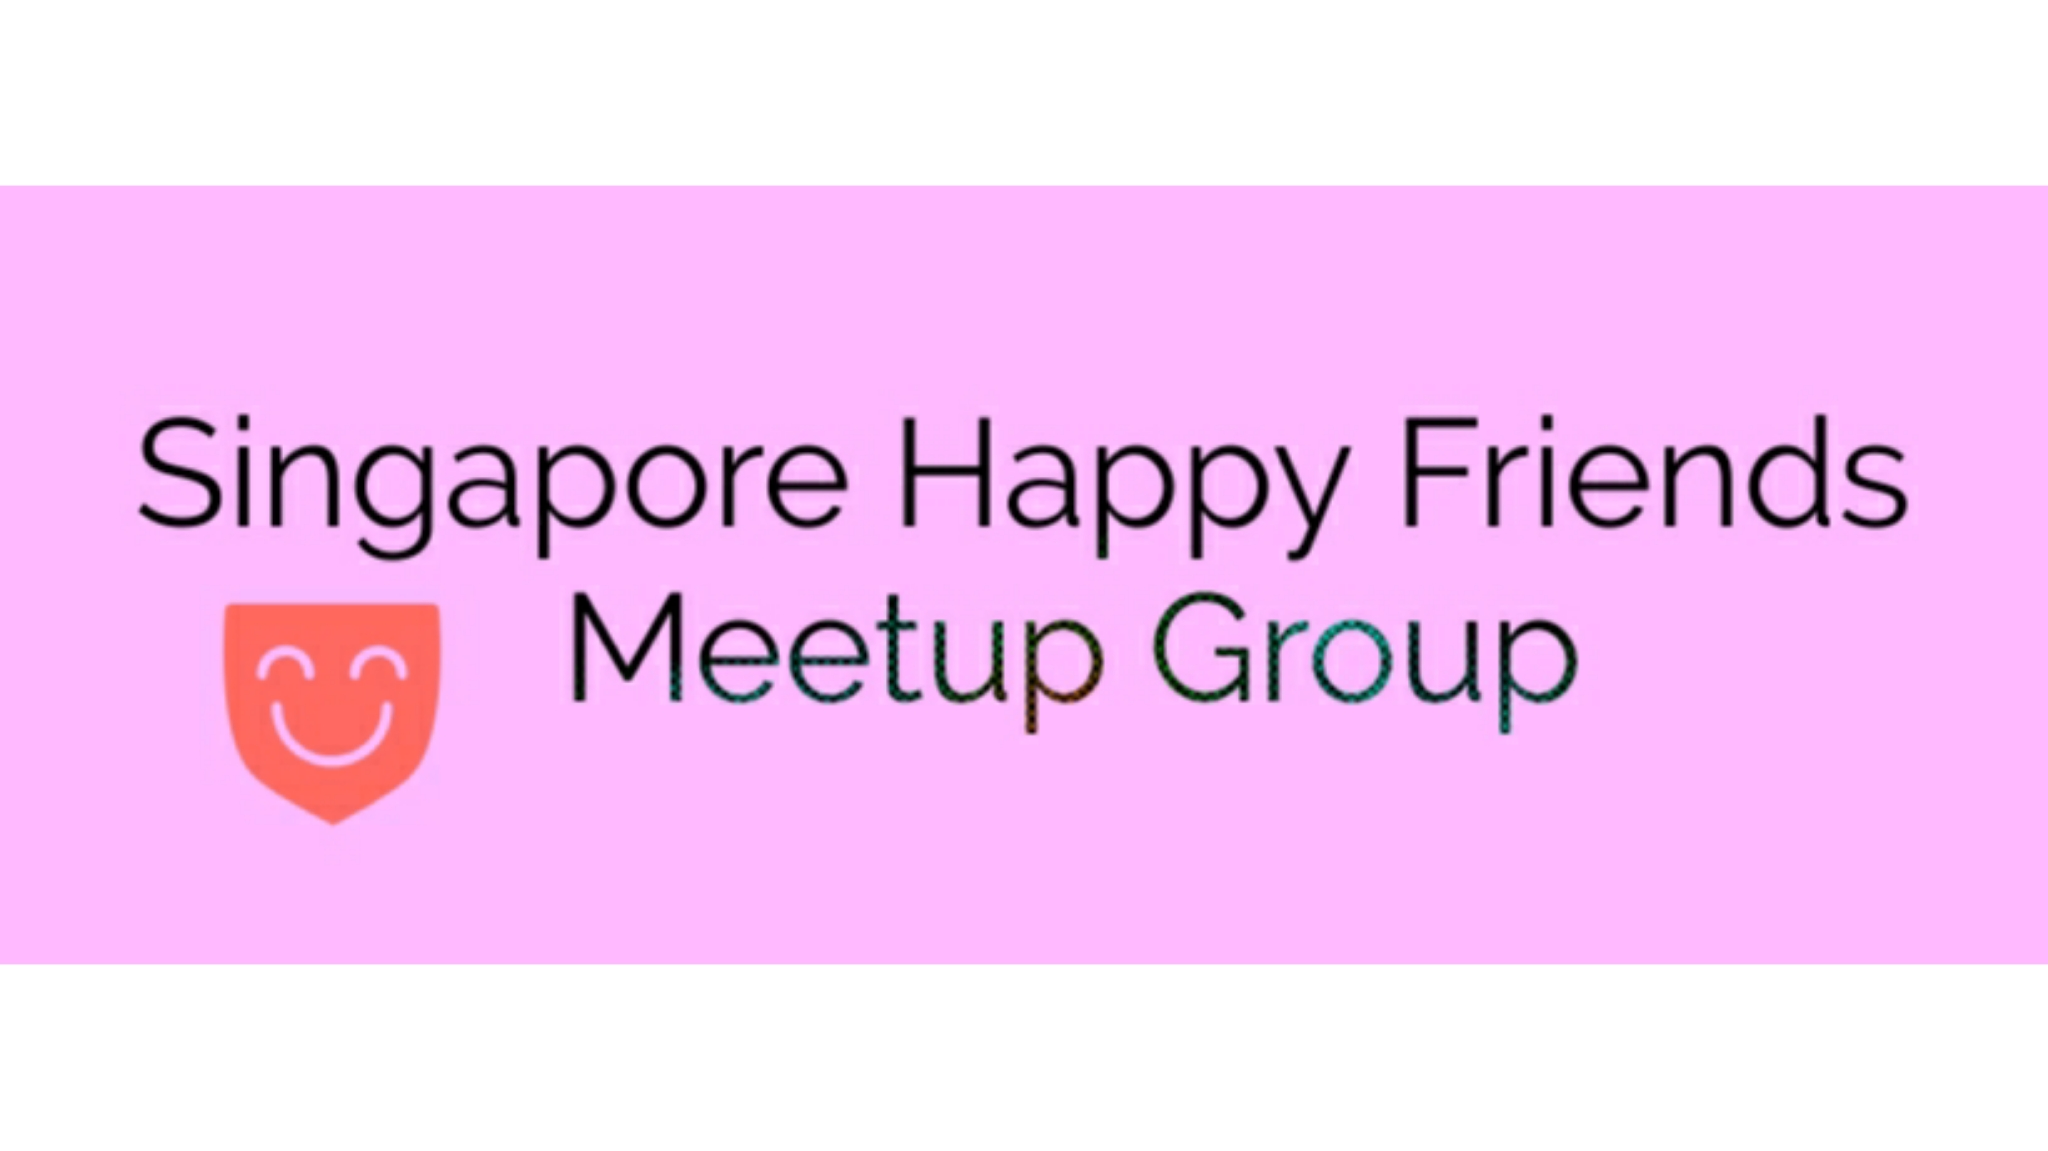 Singapore Happy Friends Meetup Group